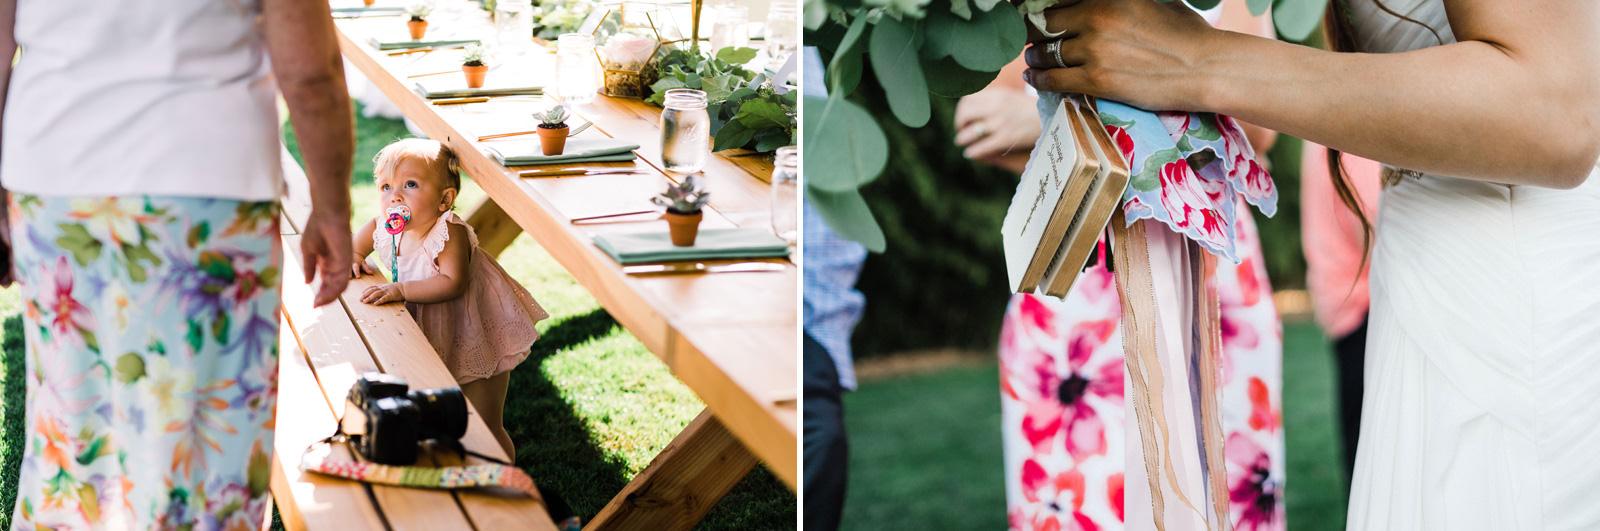 054-woodinville-lavendar-farm-wedding-with-golden-glowy-photos.jpg